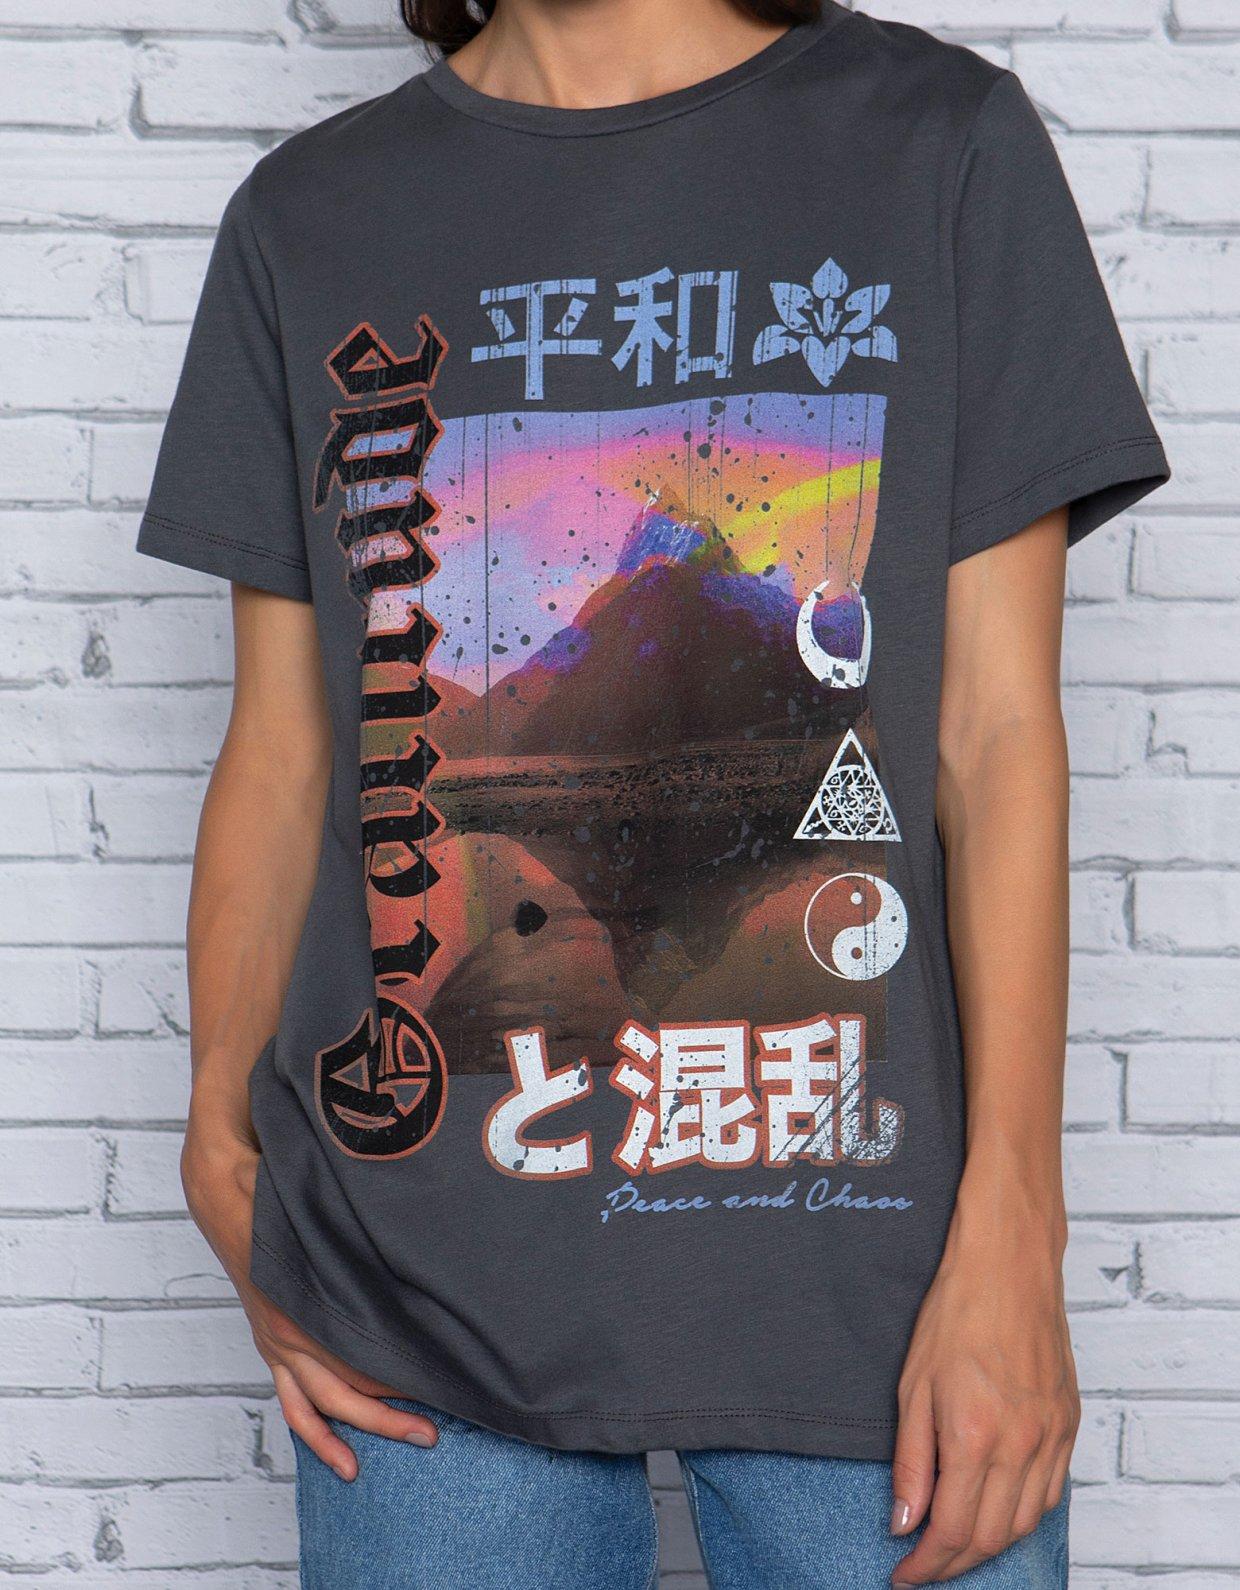 Peace & Chaos Gratitude t-shirt